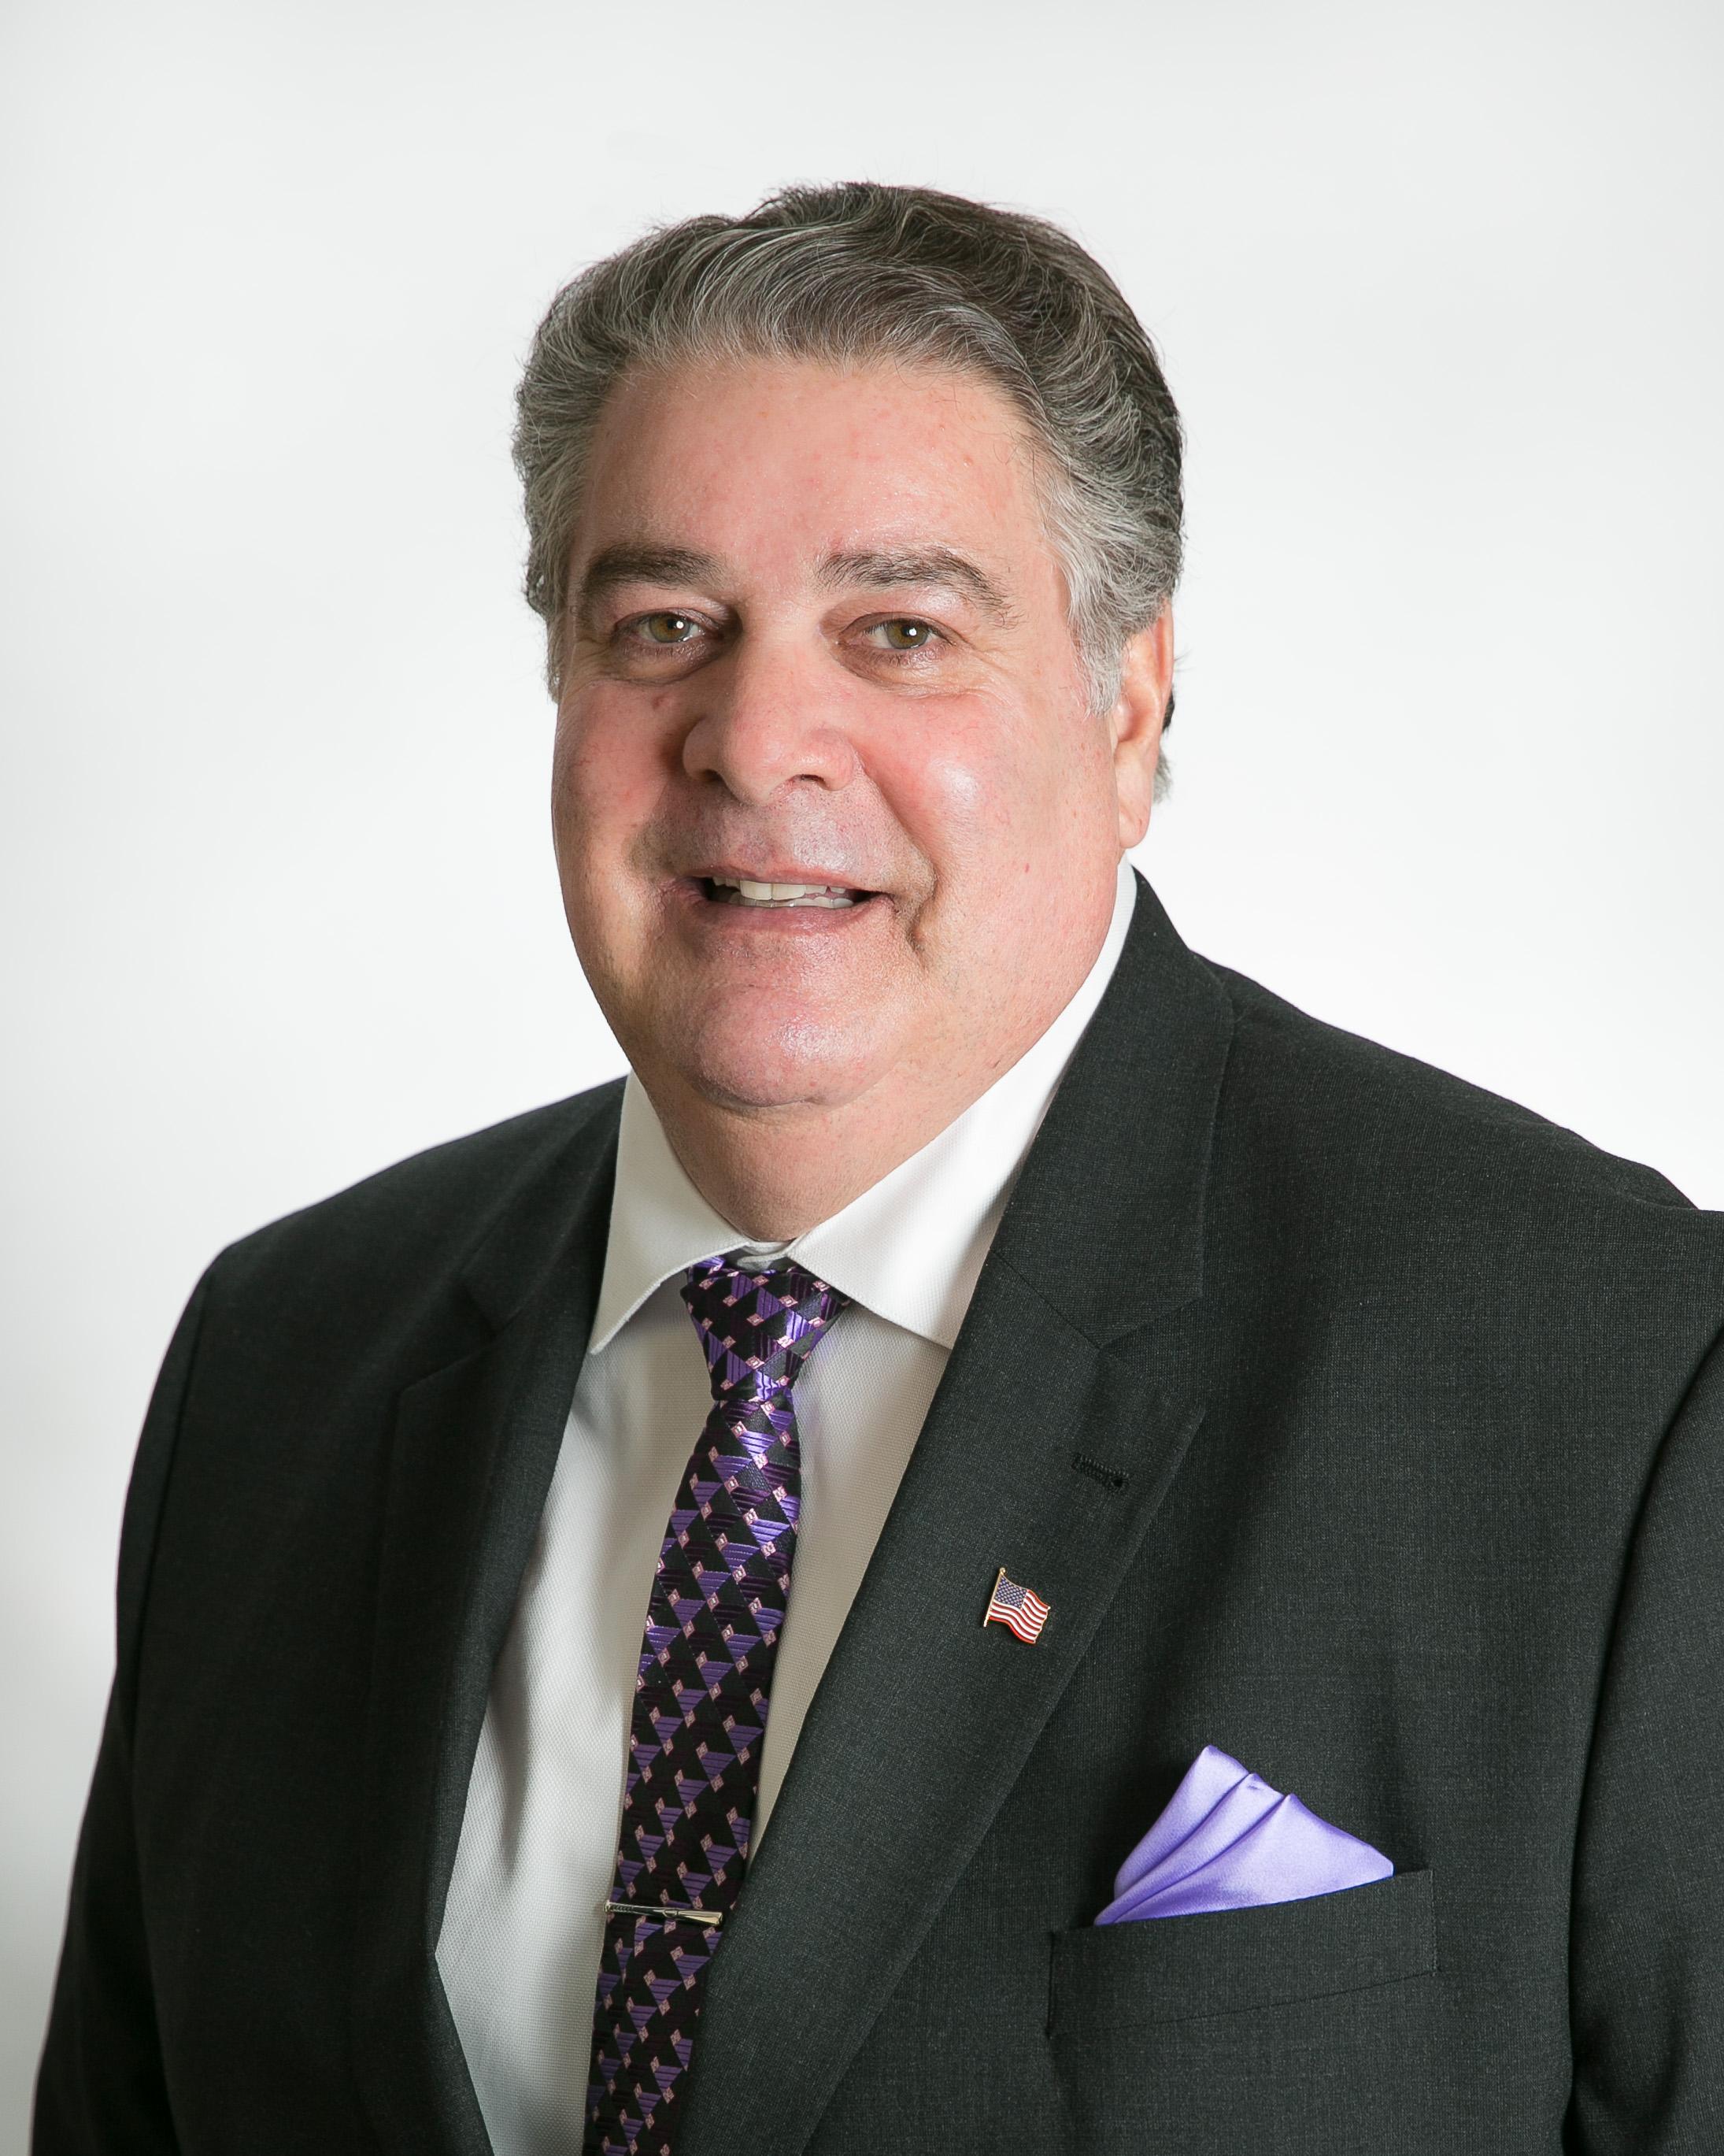 Michael Serratore